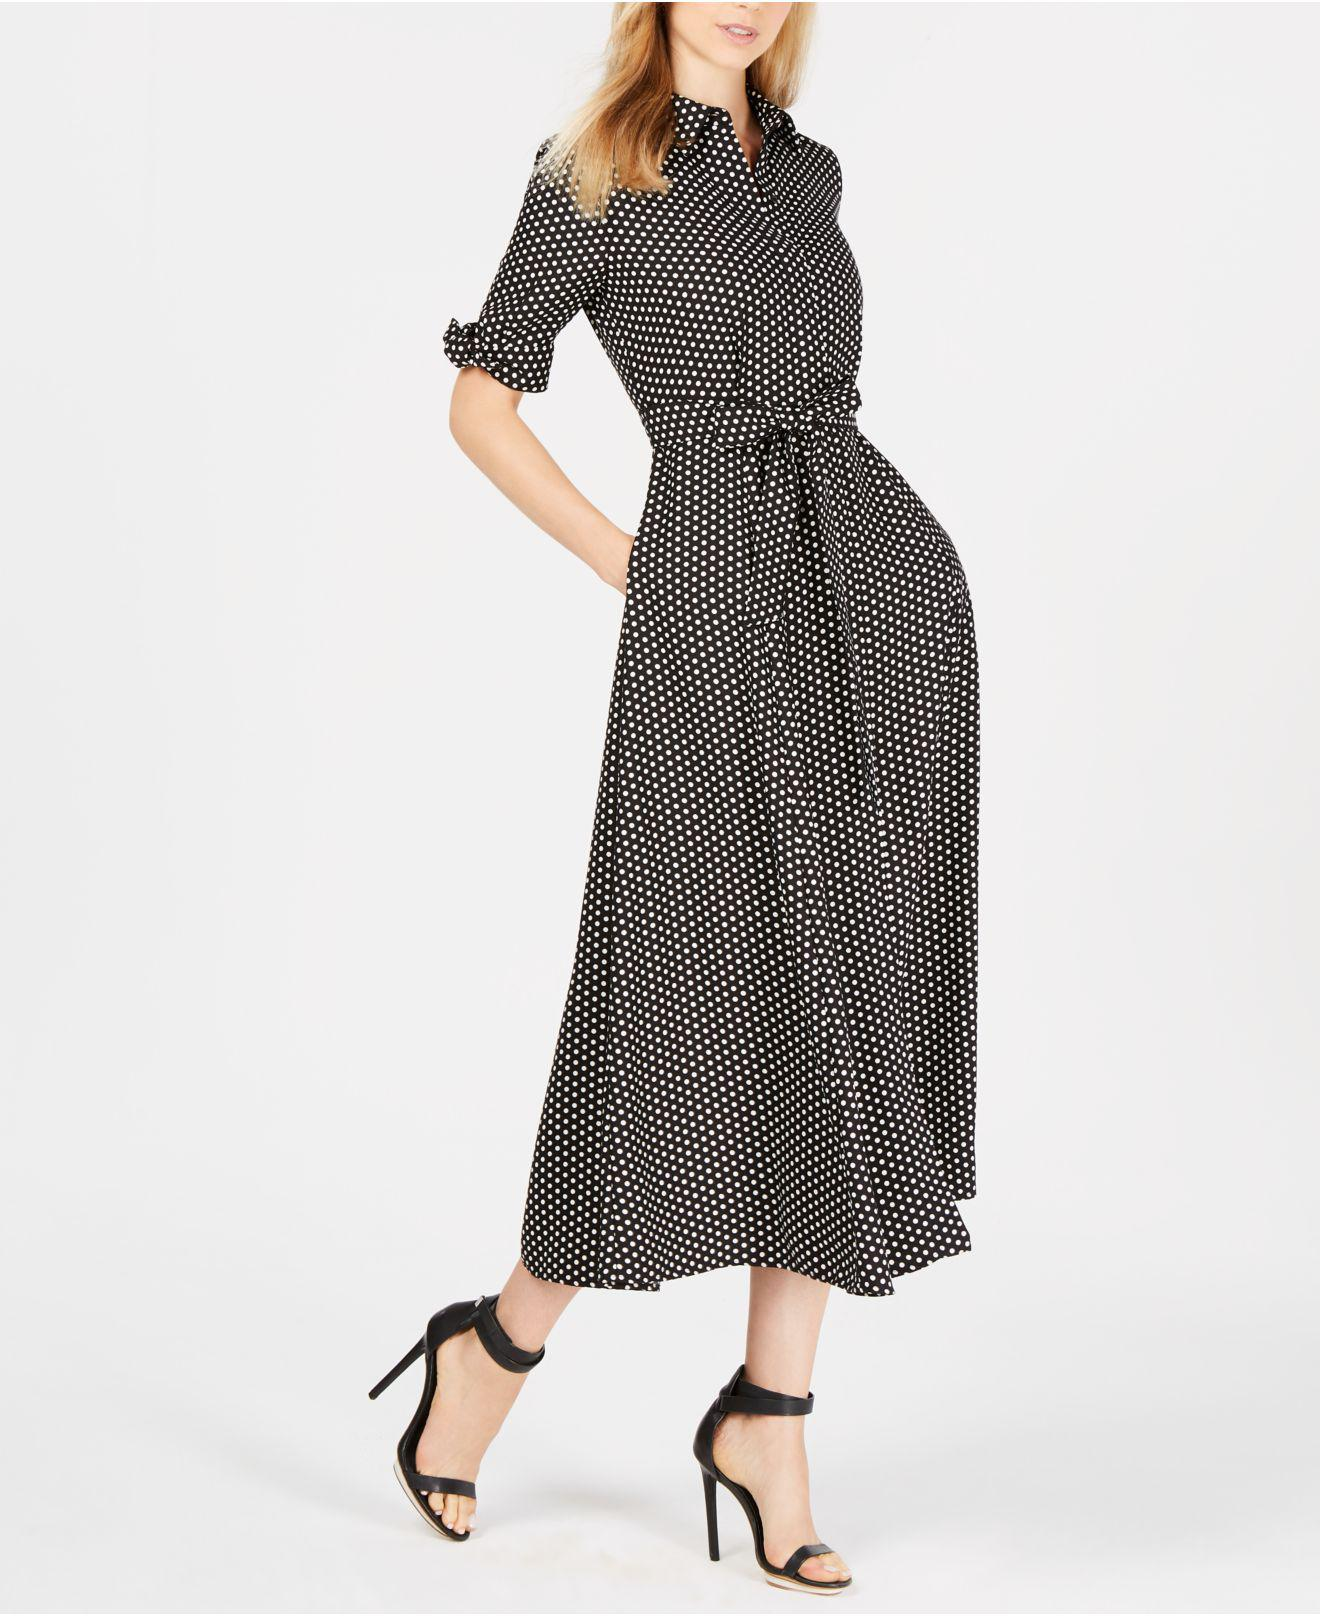 b13388adb8d Calvin Klein Polka Dot Belted Maxi Shirtdress in Black - Lyst